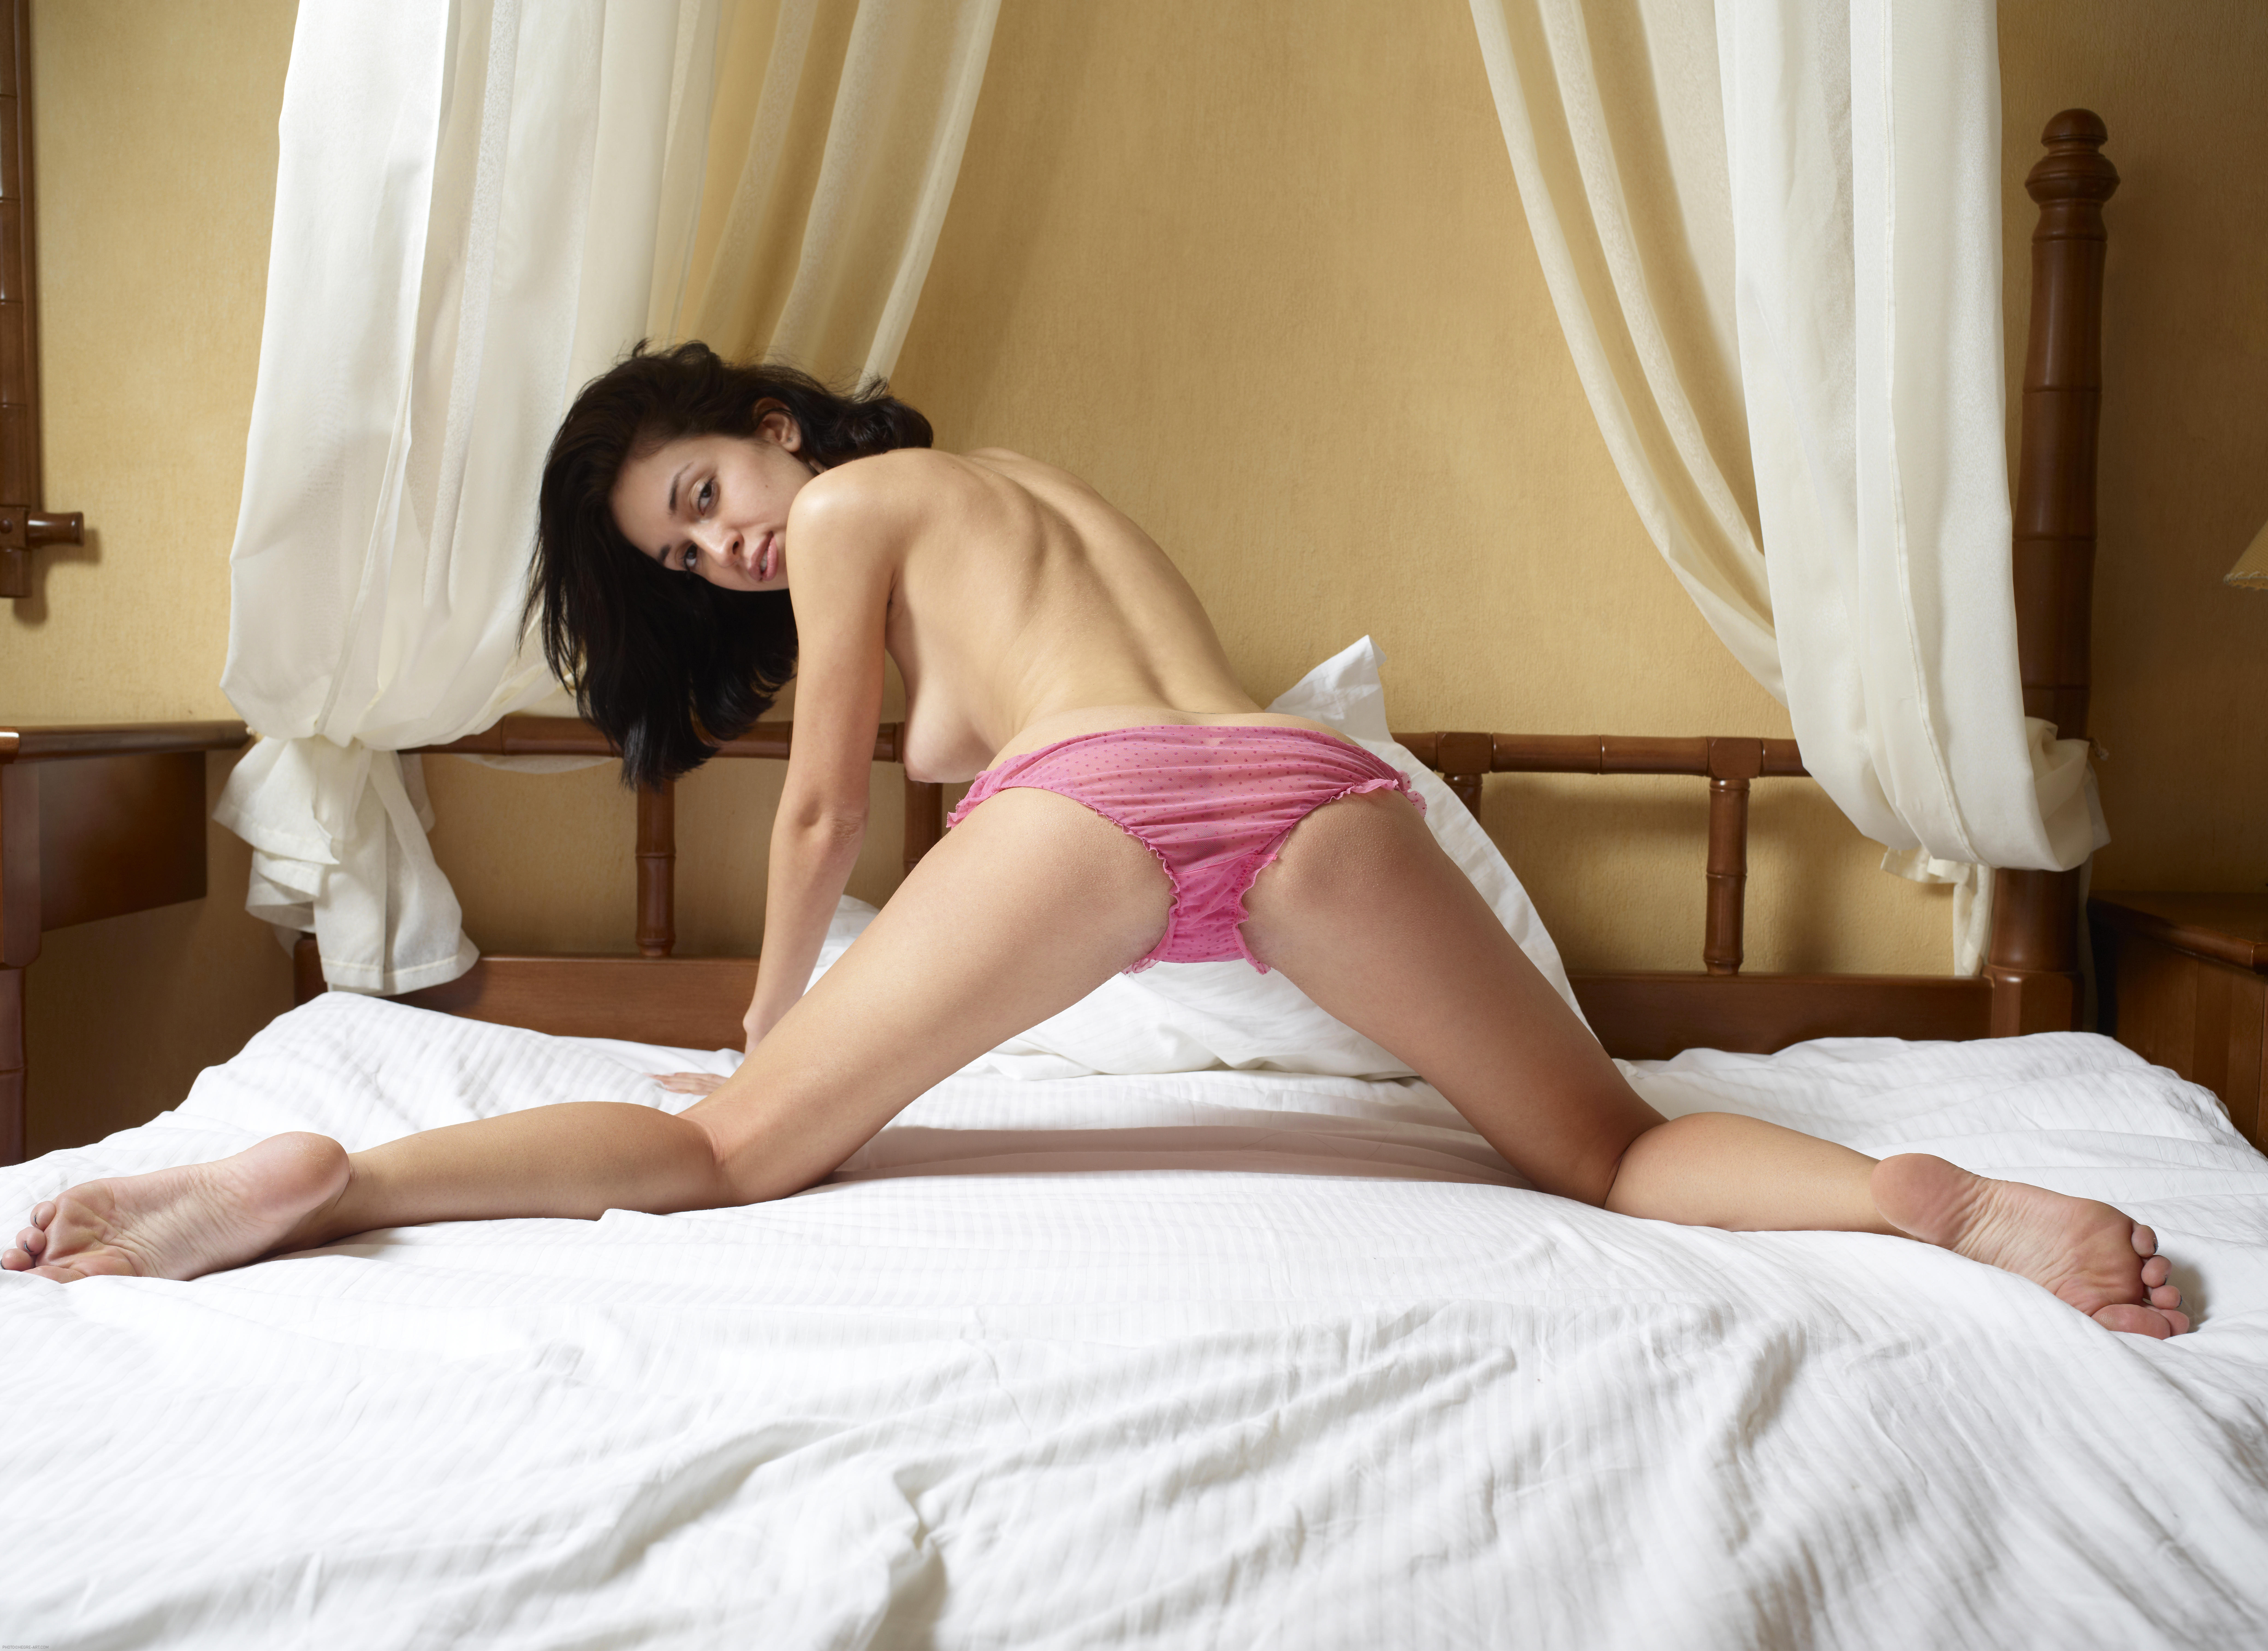 semi nude girls on bed